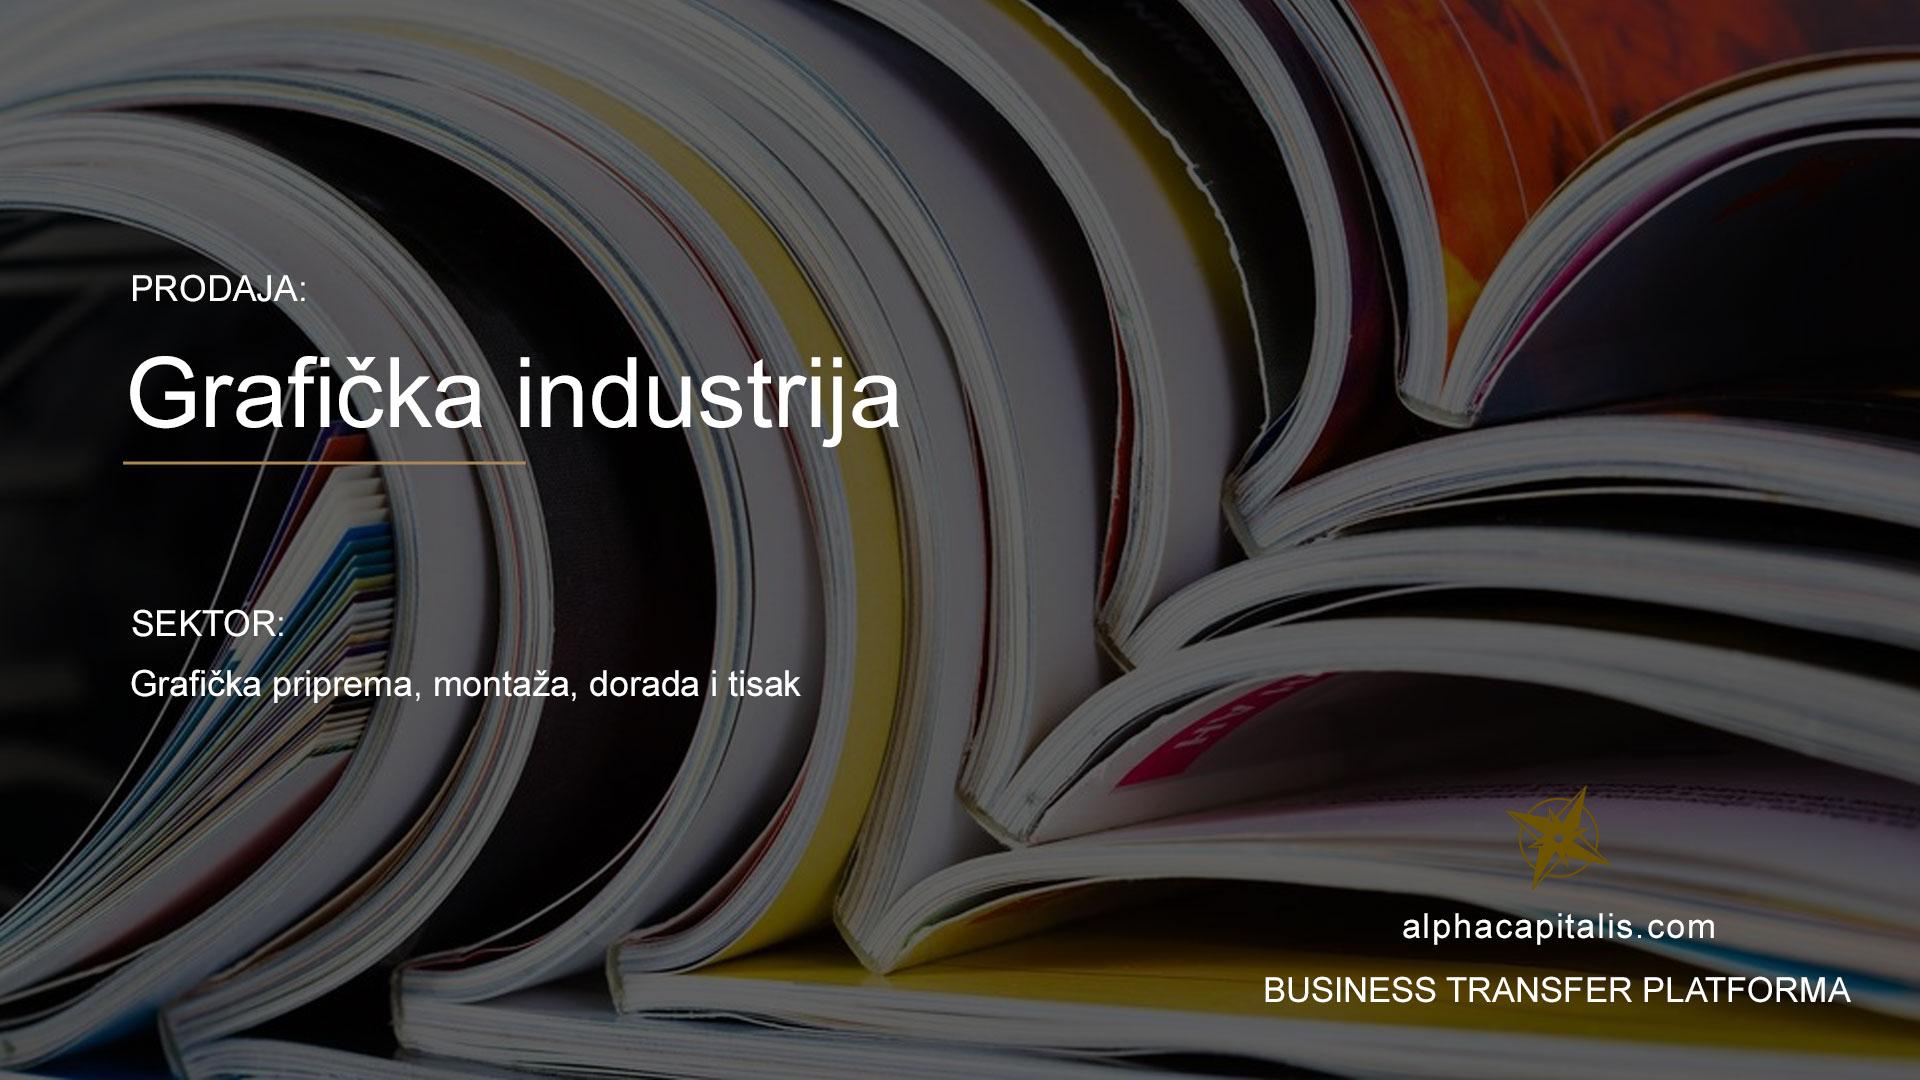 Alpha-Capitalis--Business-Transfer-Platforma_grafička-industrija